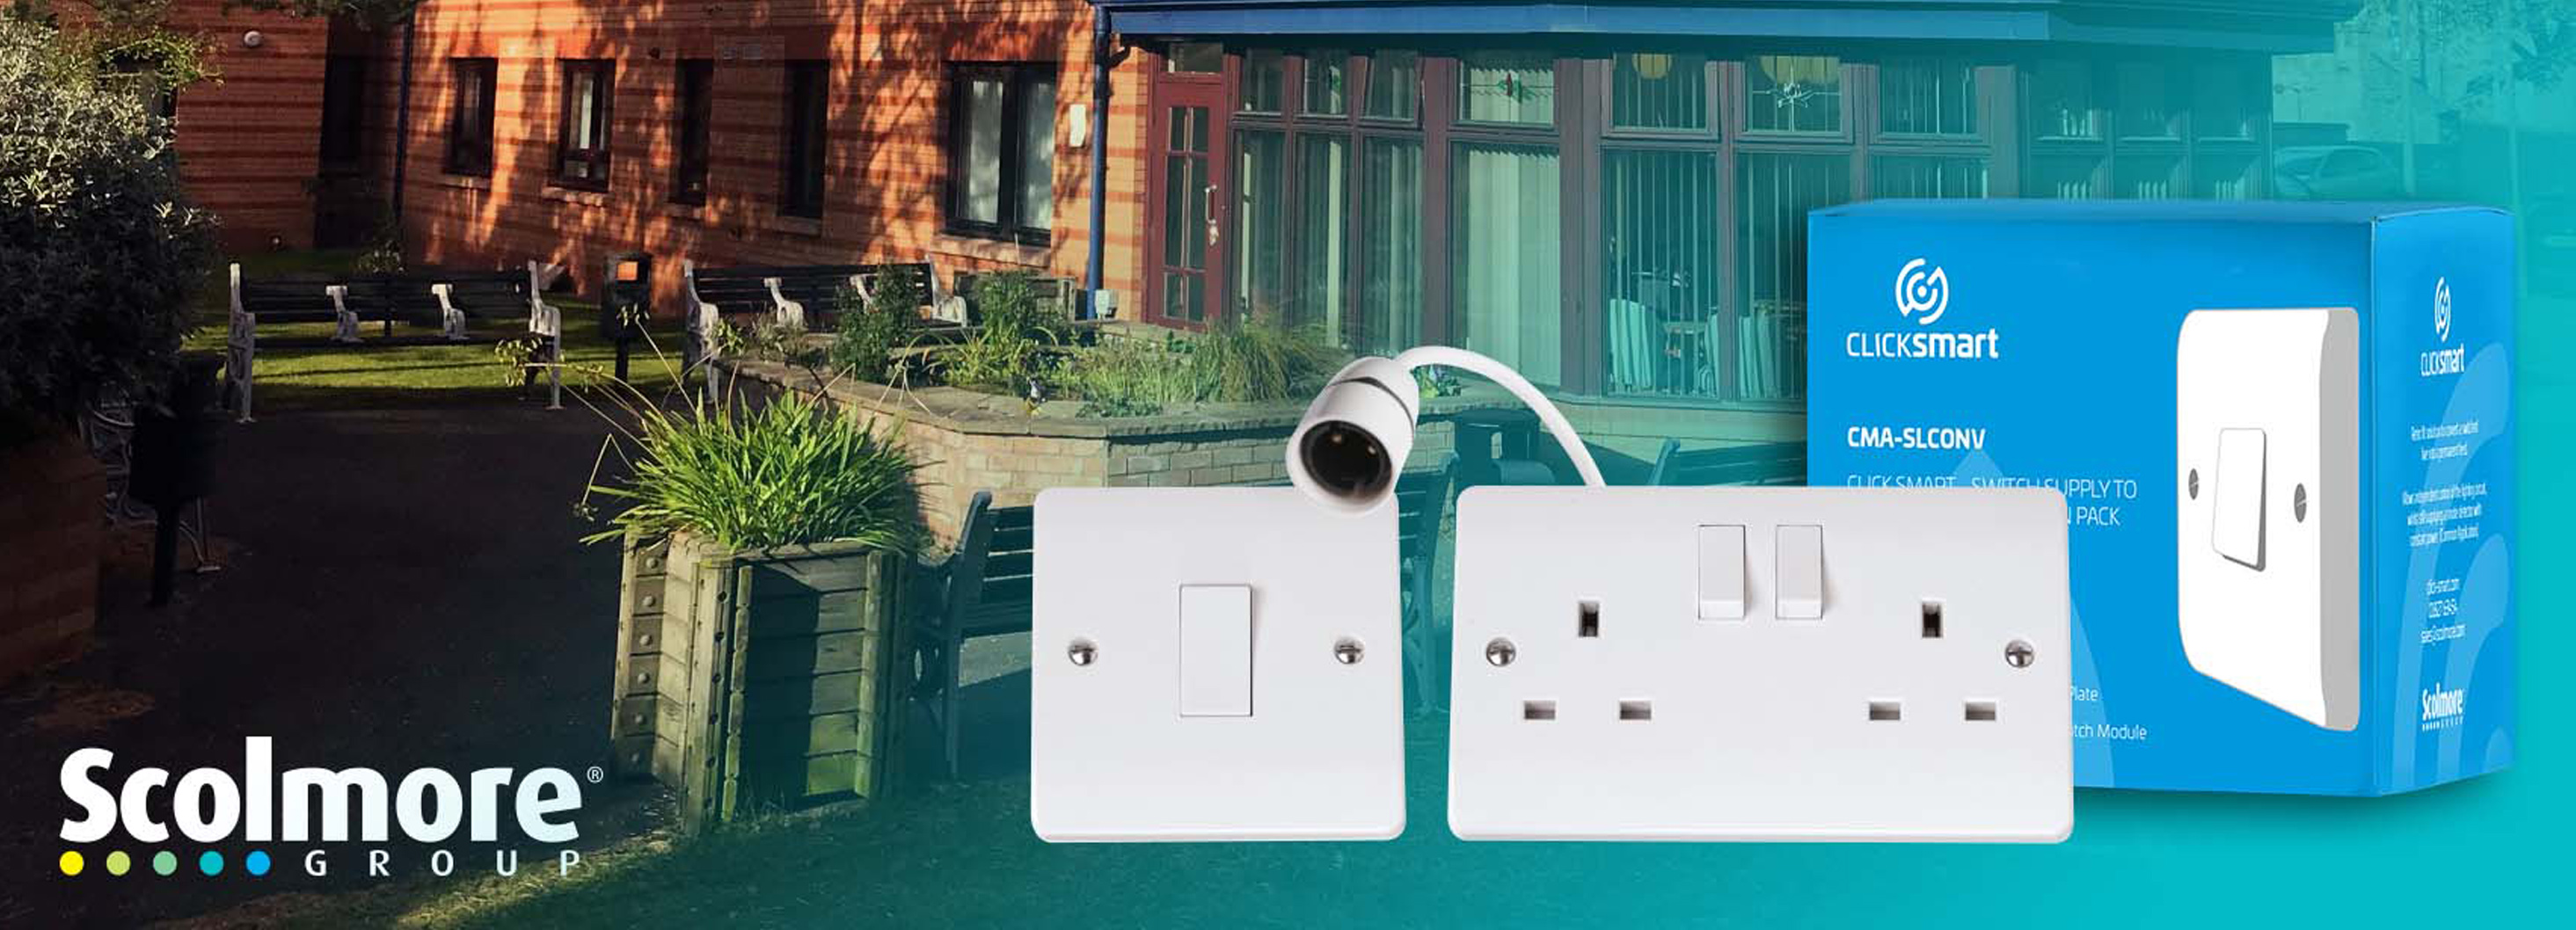 Scolmore provides smart solution for Housing Association's homes upgrade